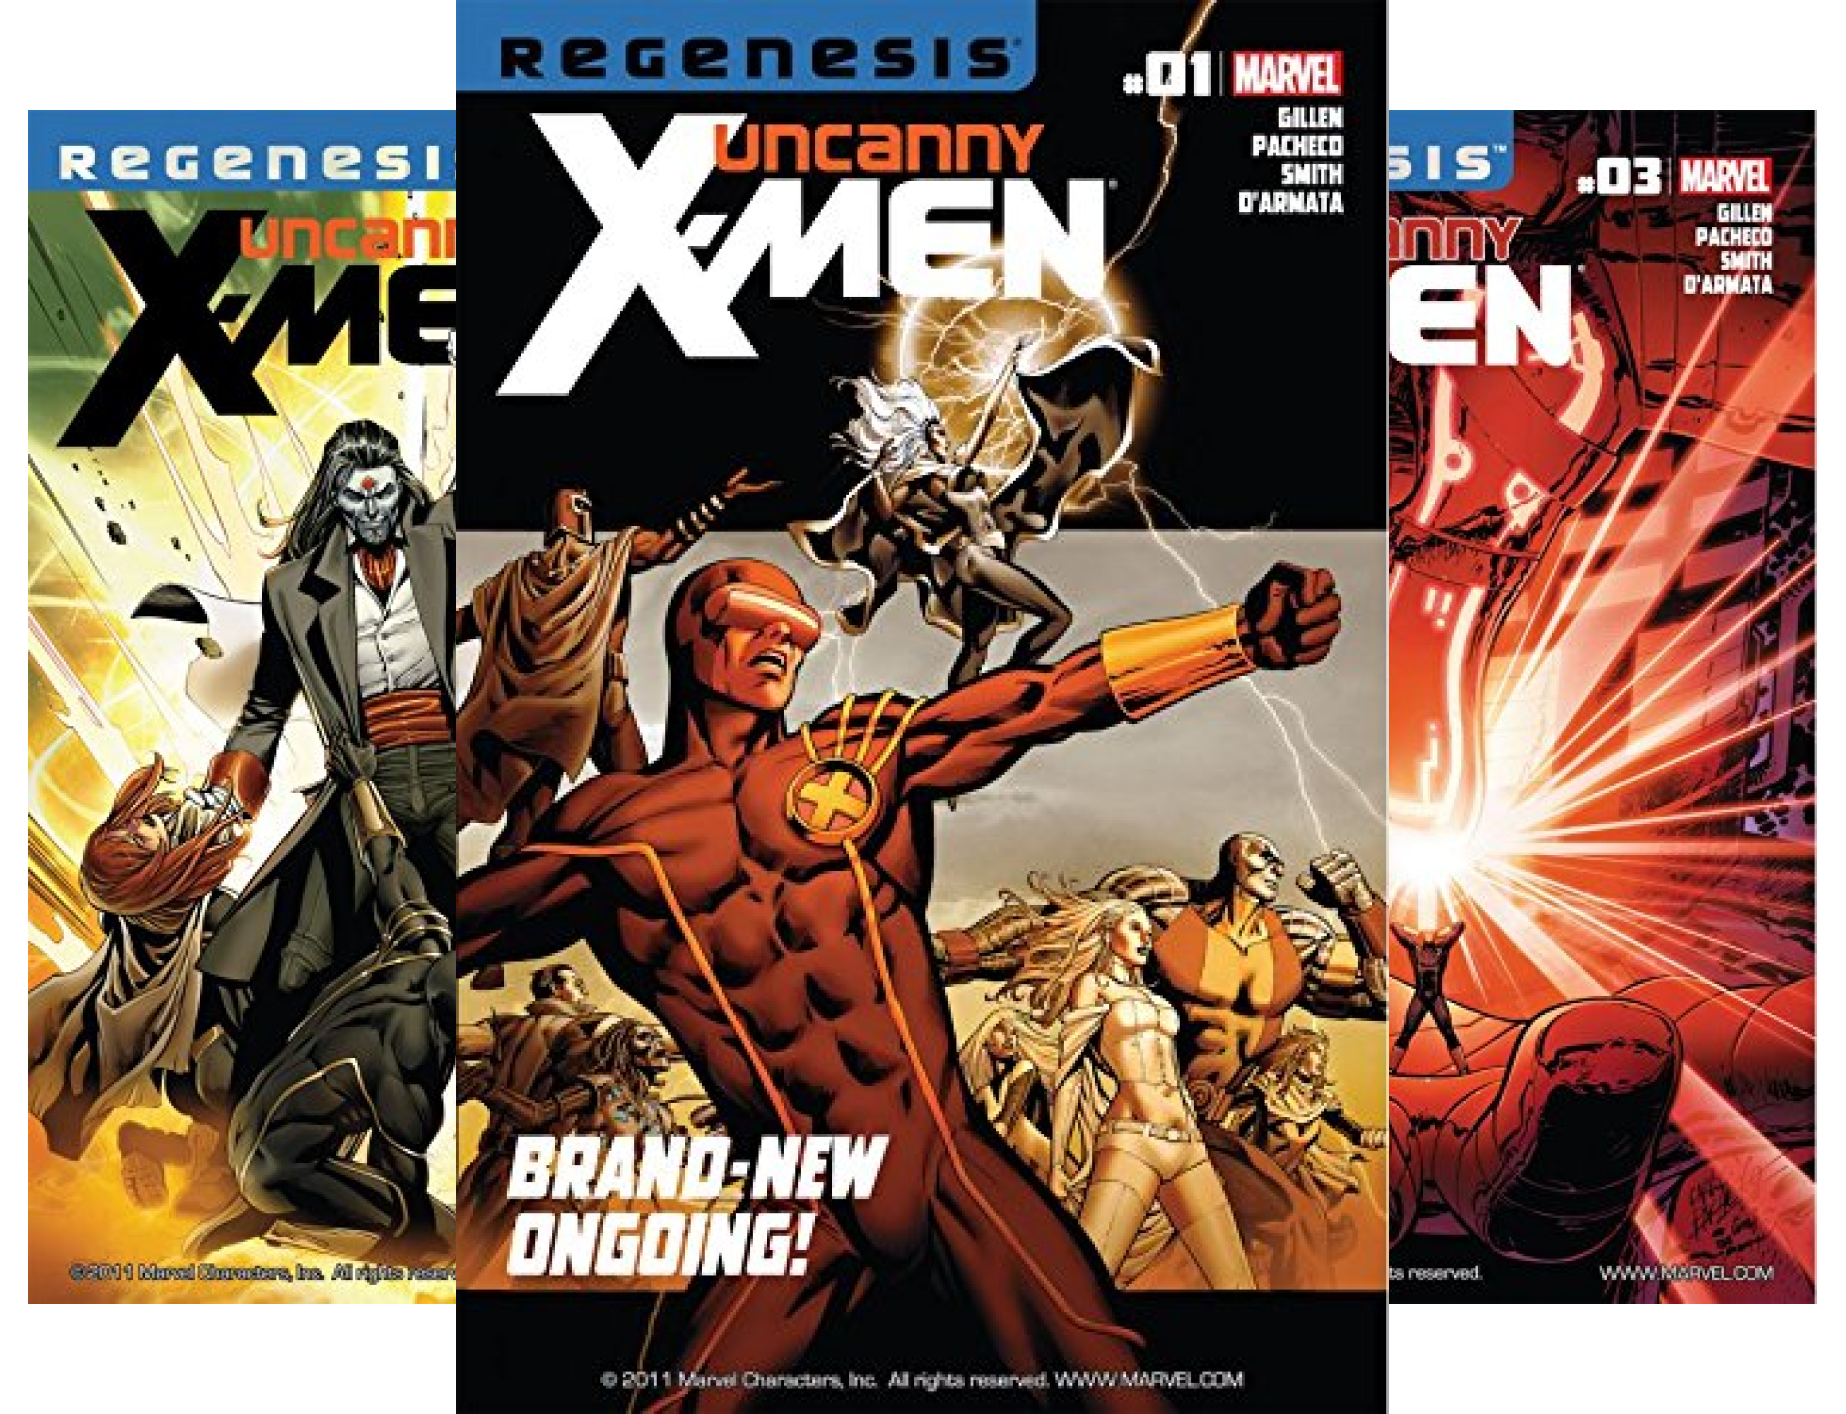 Uncanny X-Men #1-4 (4 Book Series)